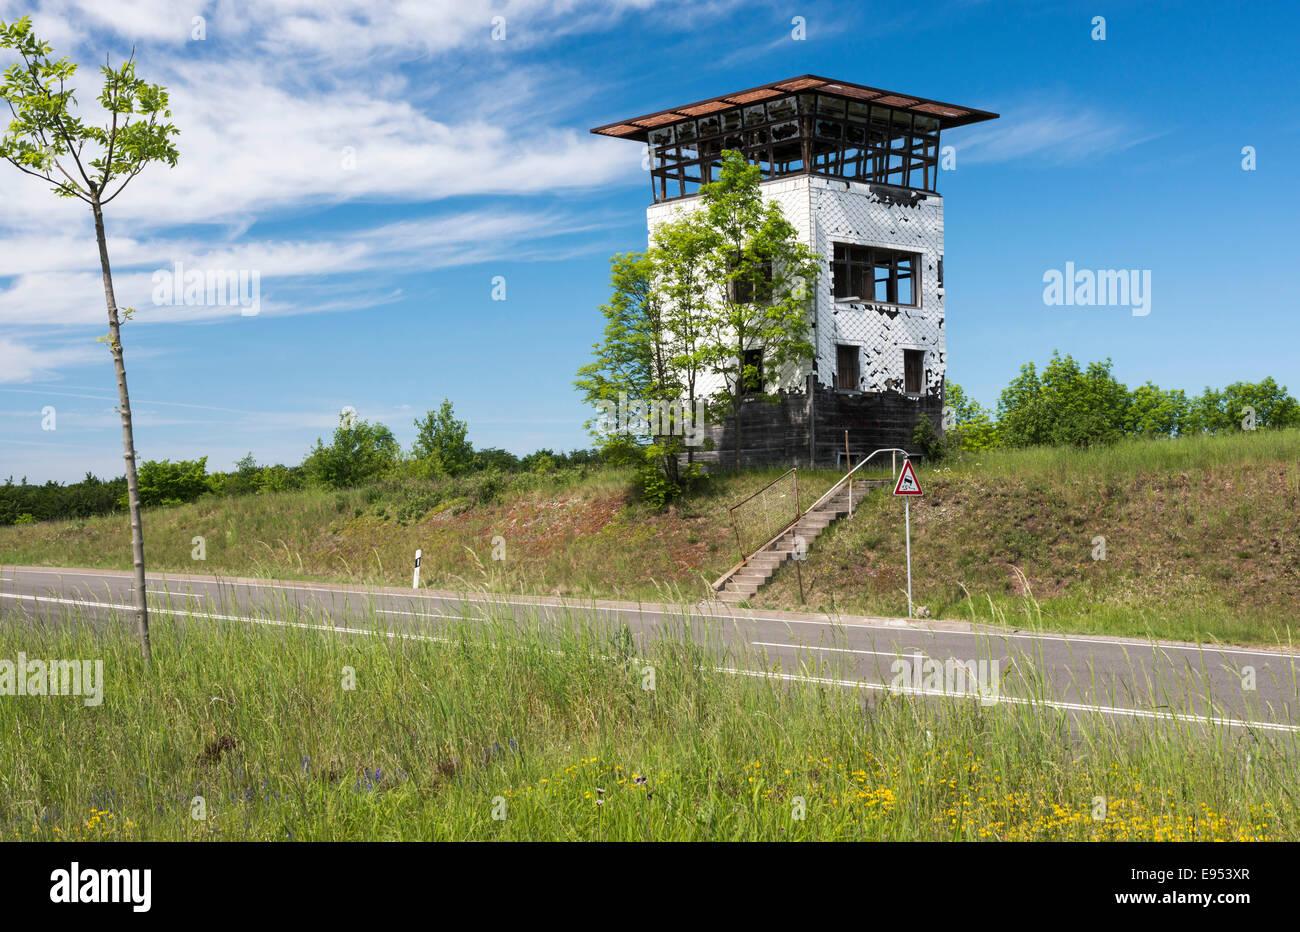 Old border tower on country raod, street L3019, former border crossing point Eußenhausen-Henneberg 1973 to - Stock Image